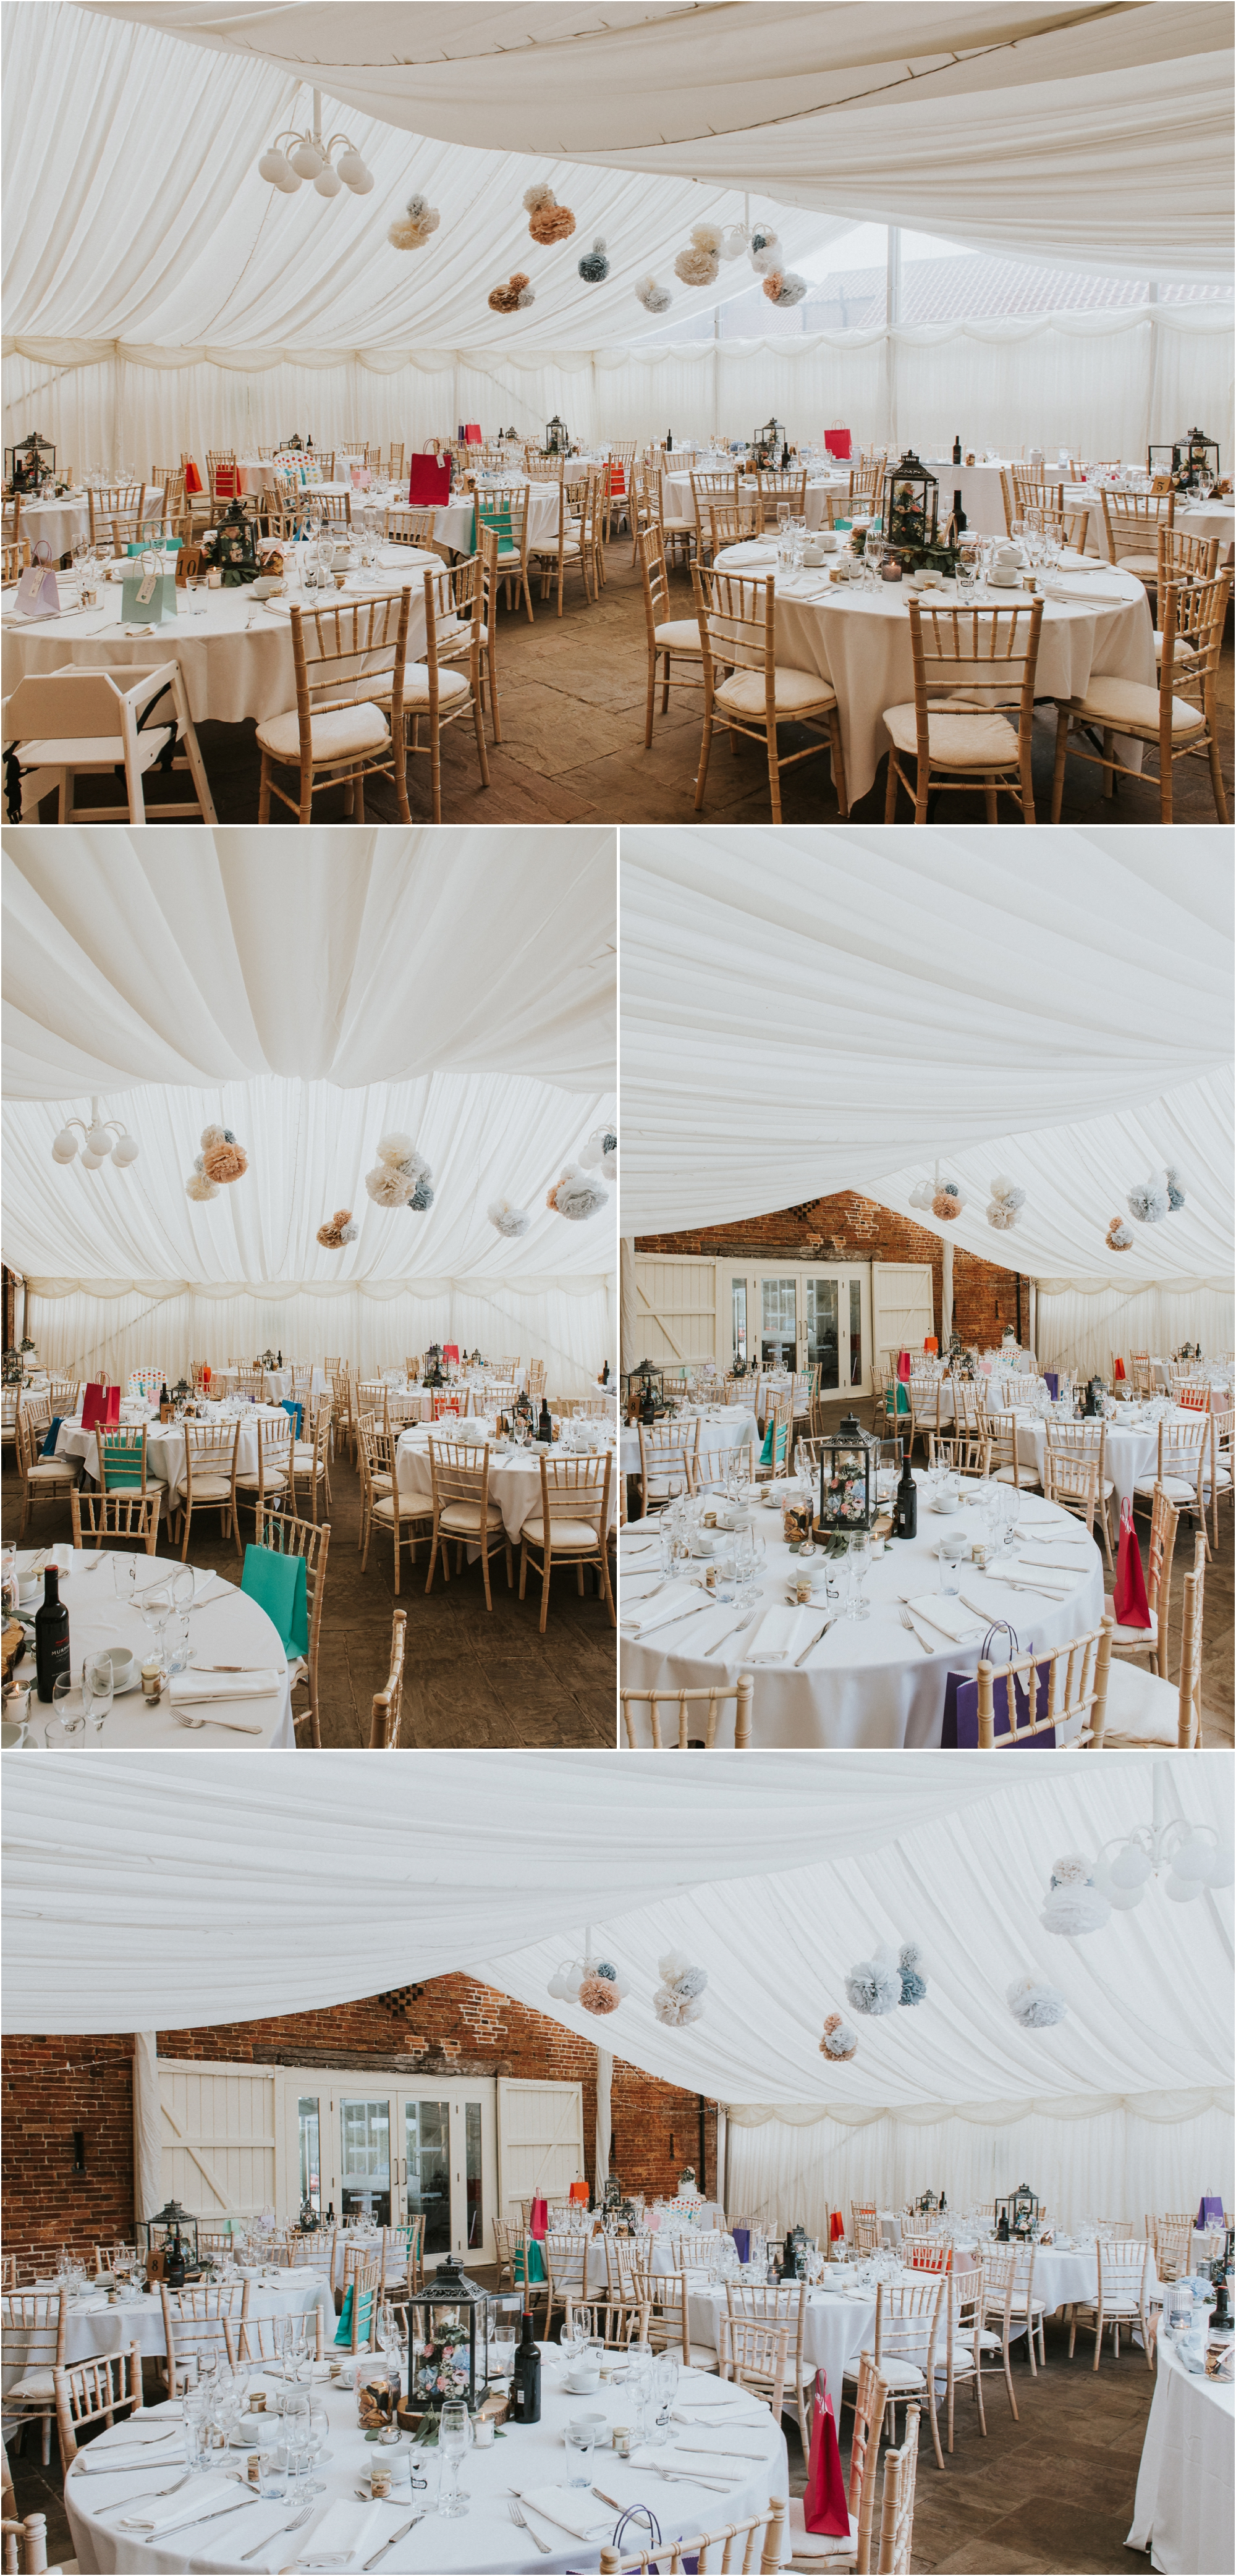 PheasantBrewery-LukeHolroyd-Yorkshirewedding_000136.jpg